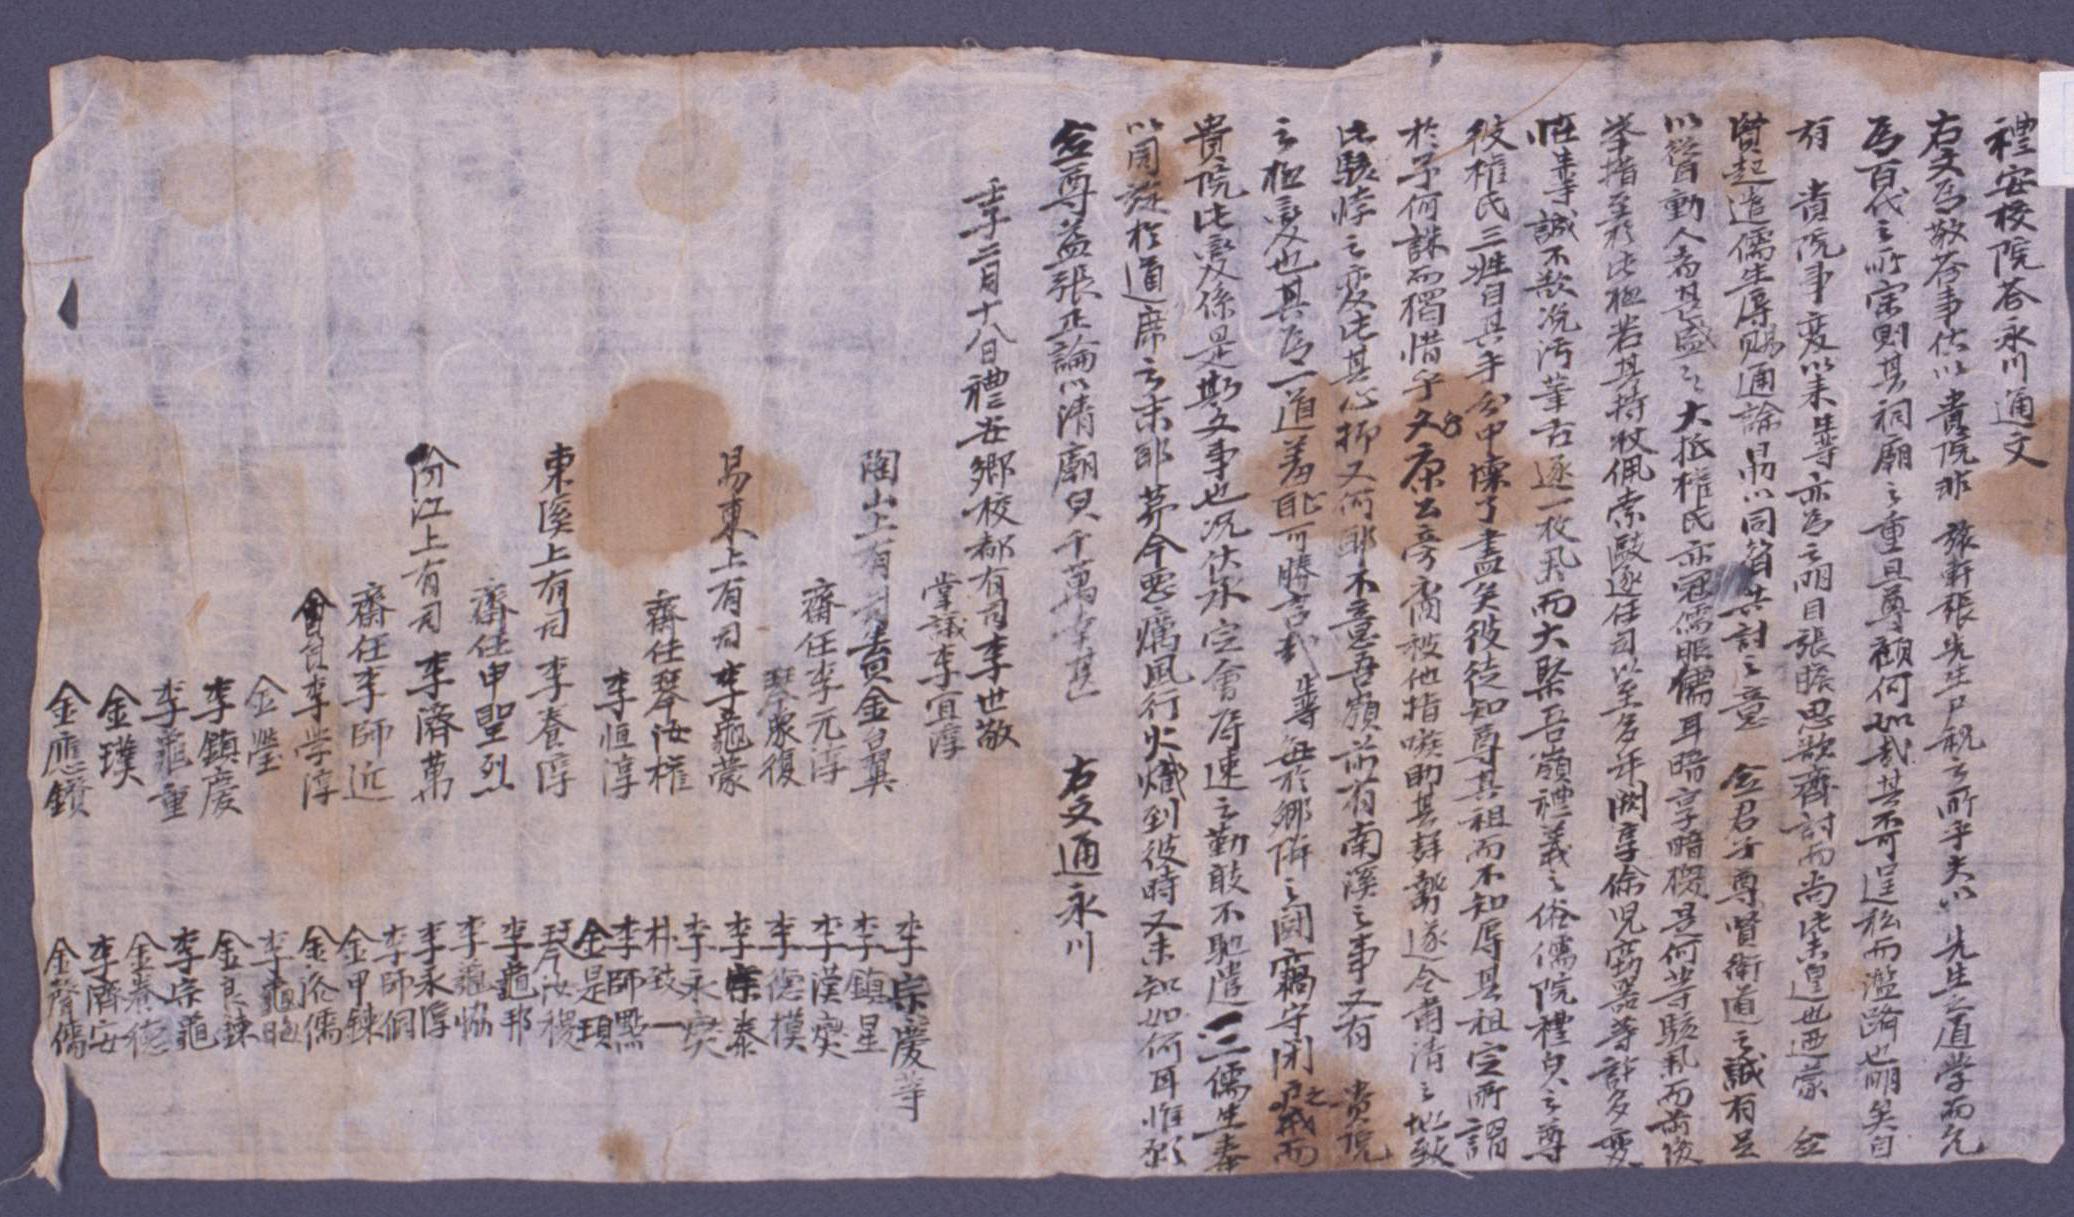 Yean (禮安) scholars_ circular letter to Yo˘ngch_o˘n (永川) scholars in 1792